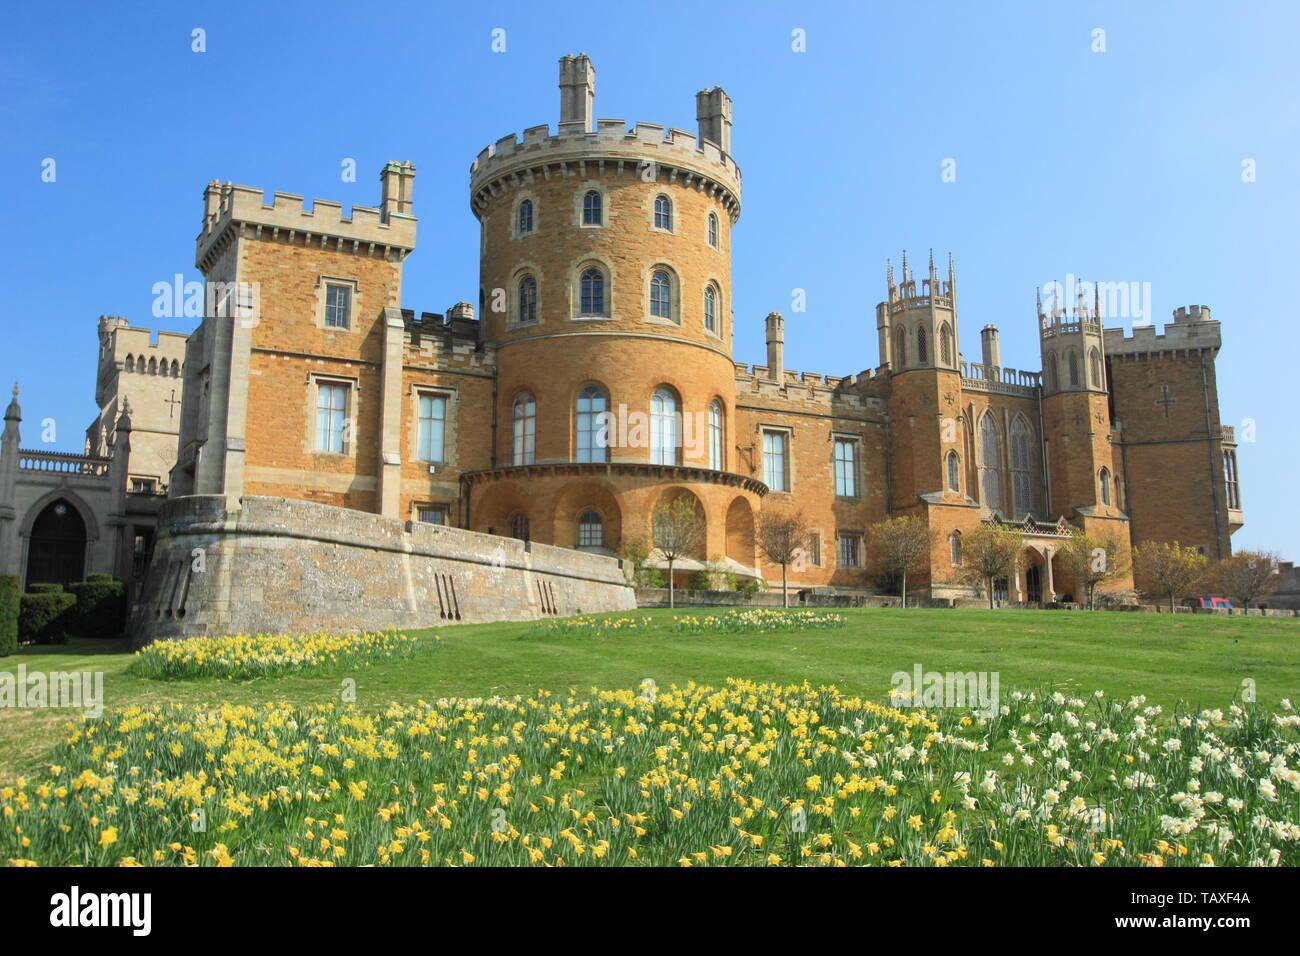 Castillo de Belvoir, asiento del duque de Rutland, Leicestershire, Inglaterra, Reino Unido - muelle Foto de stock